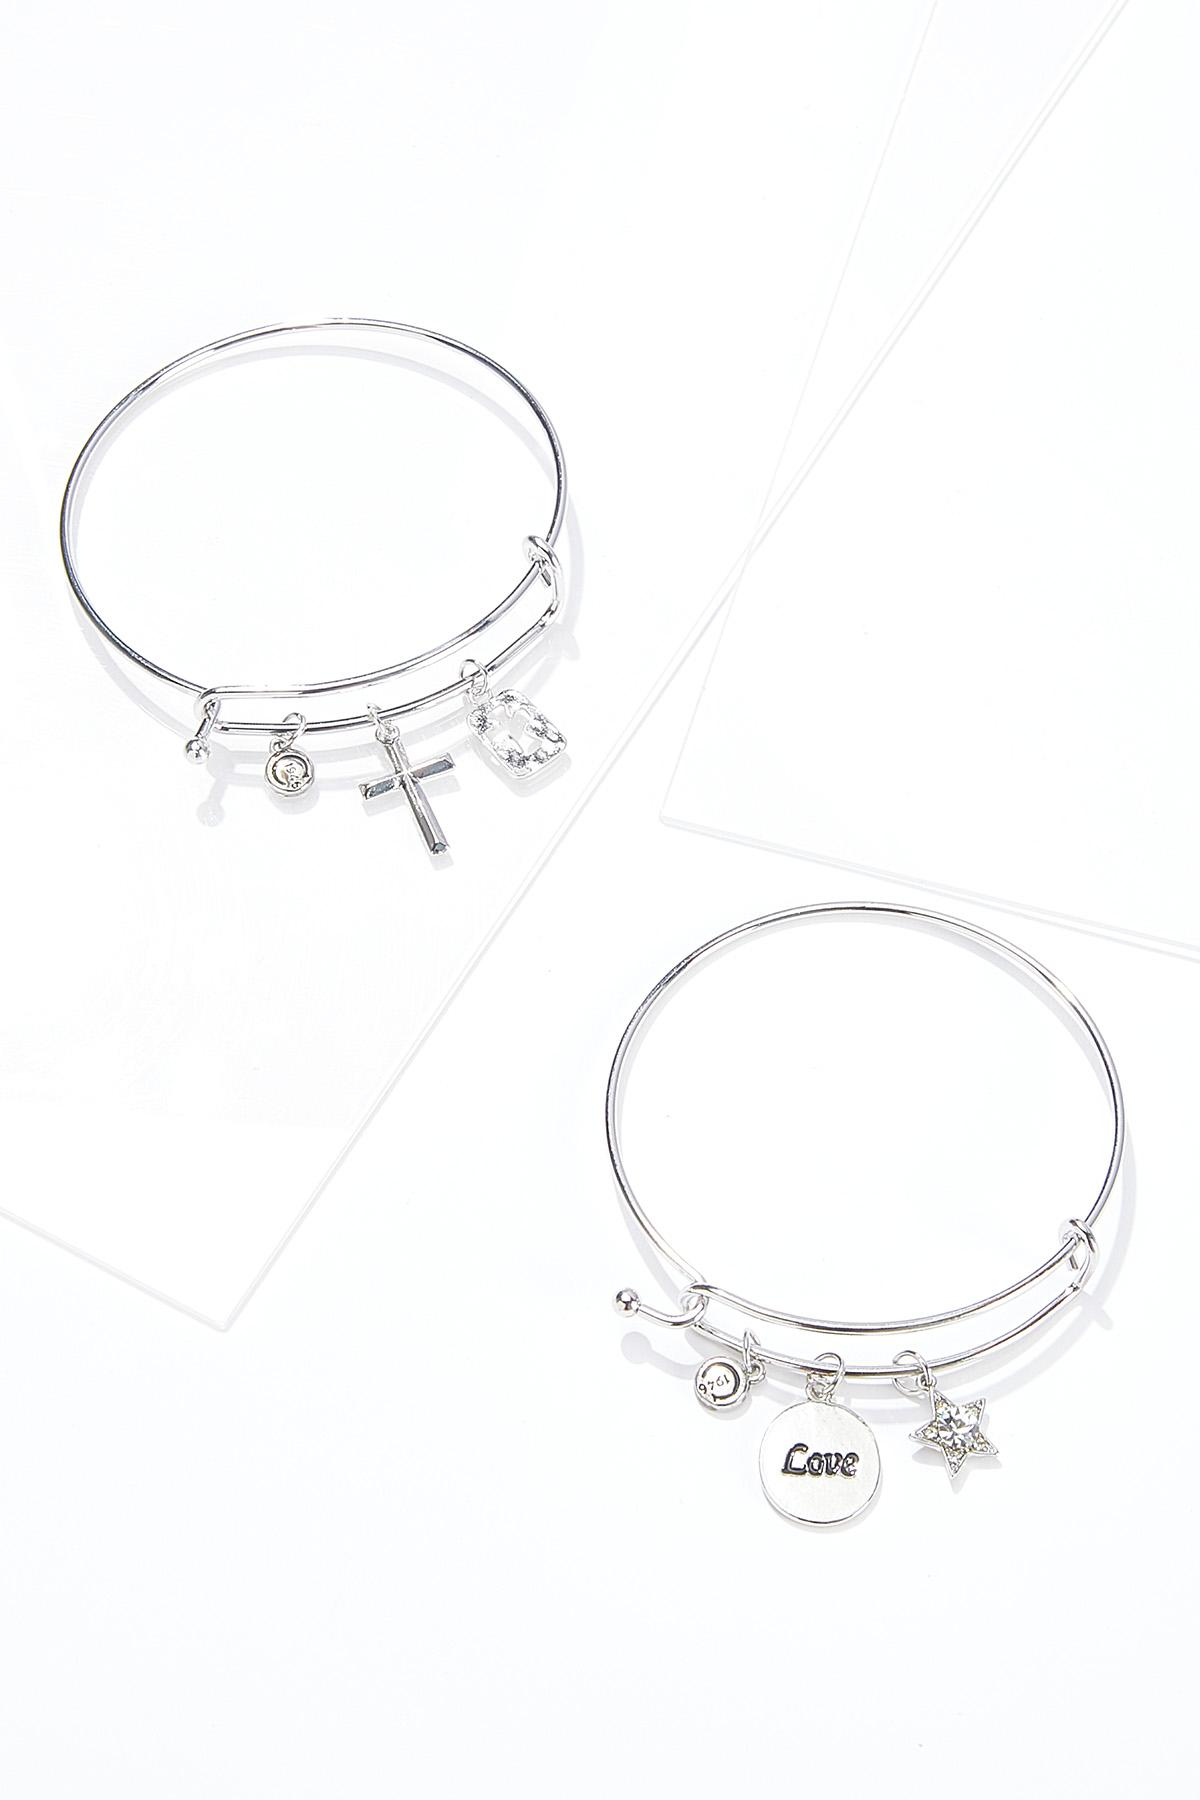 Heart Cross Charm Bracelet Set